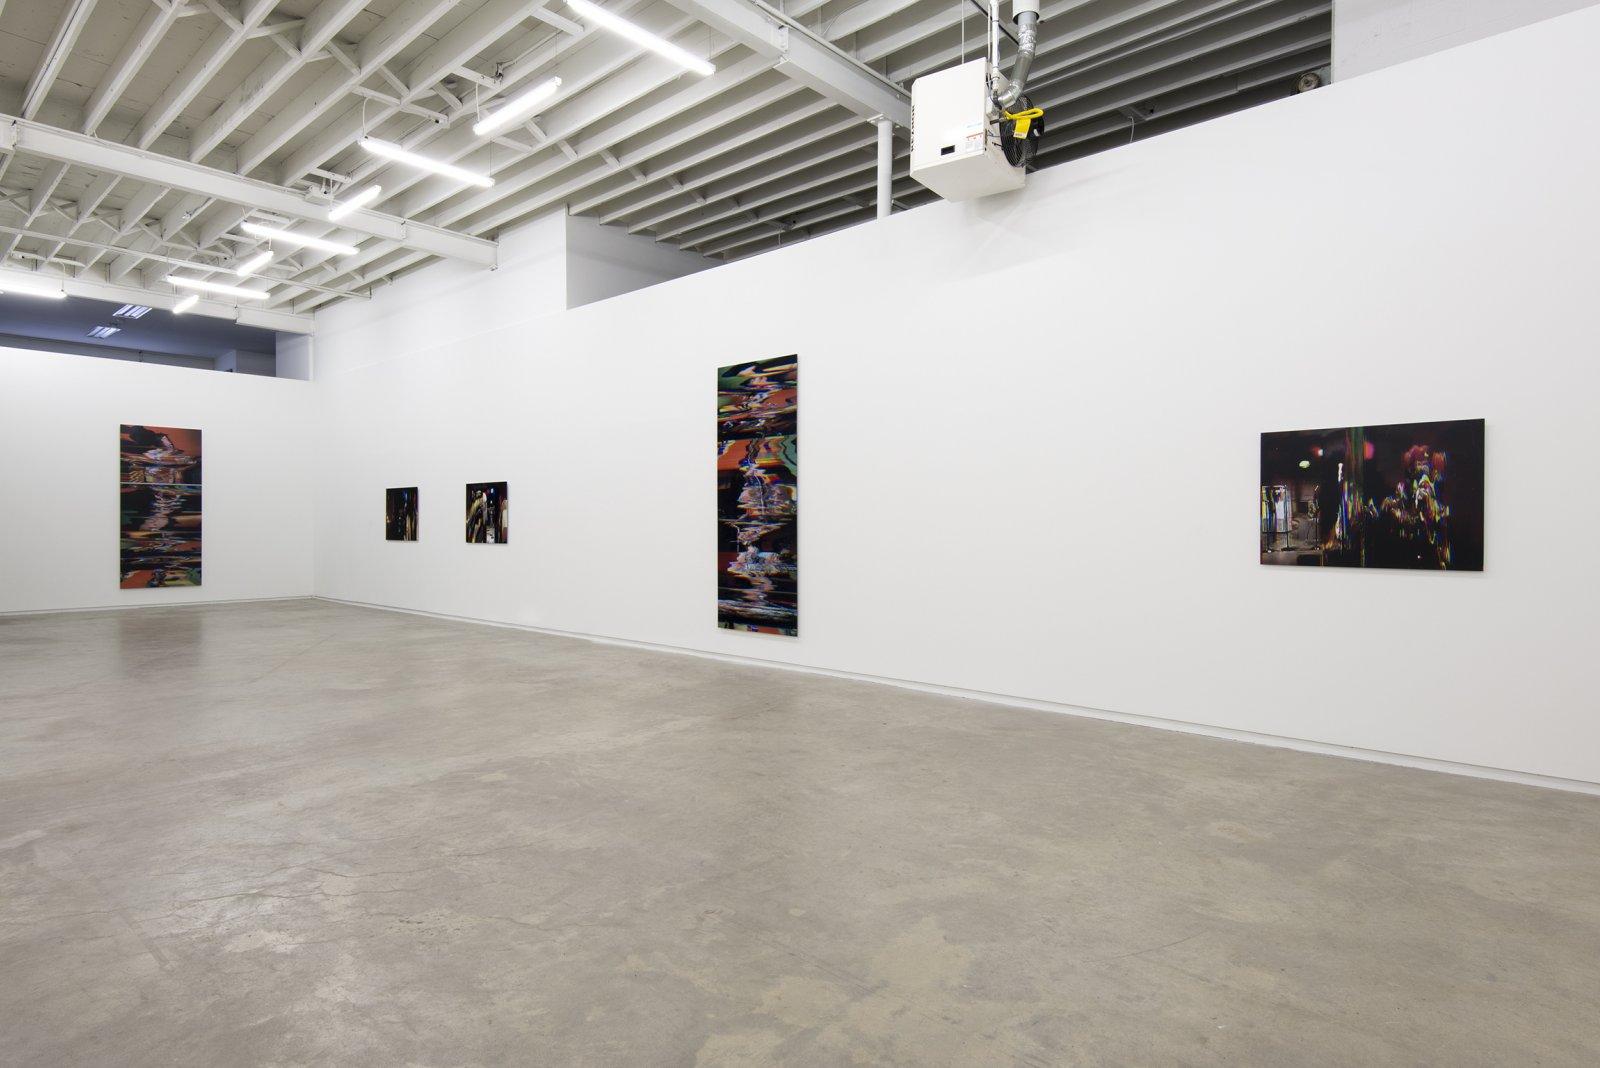 Raymond Boisjoly, installation view, Intervals, Catriona Jeffries, 2013 by Raymond Boisjoly